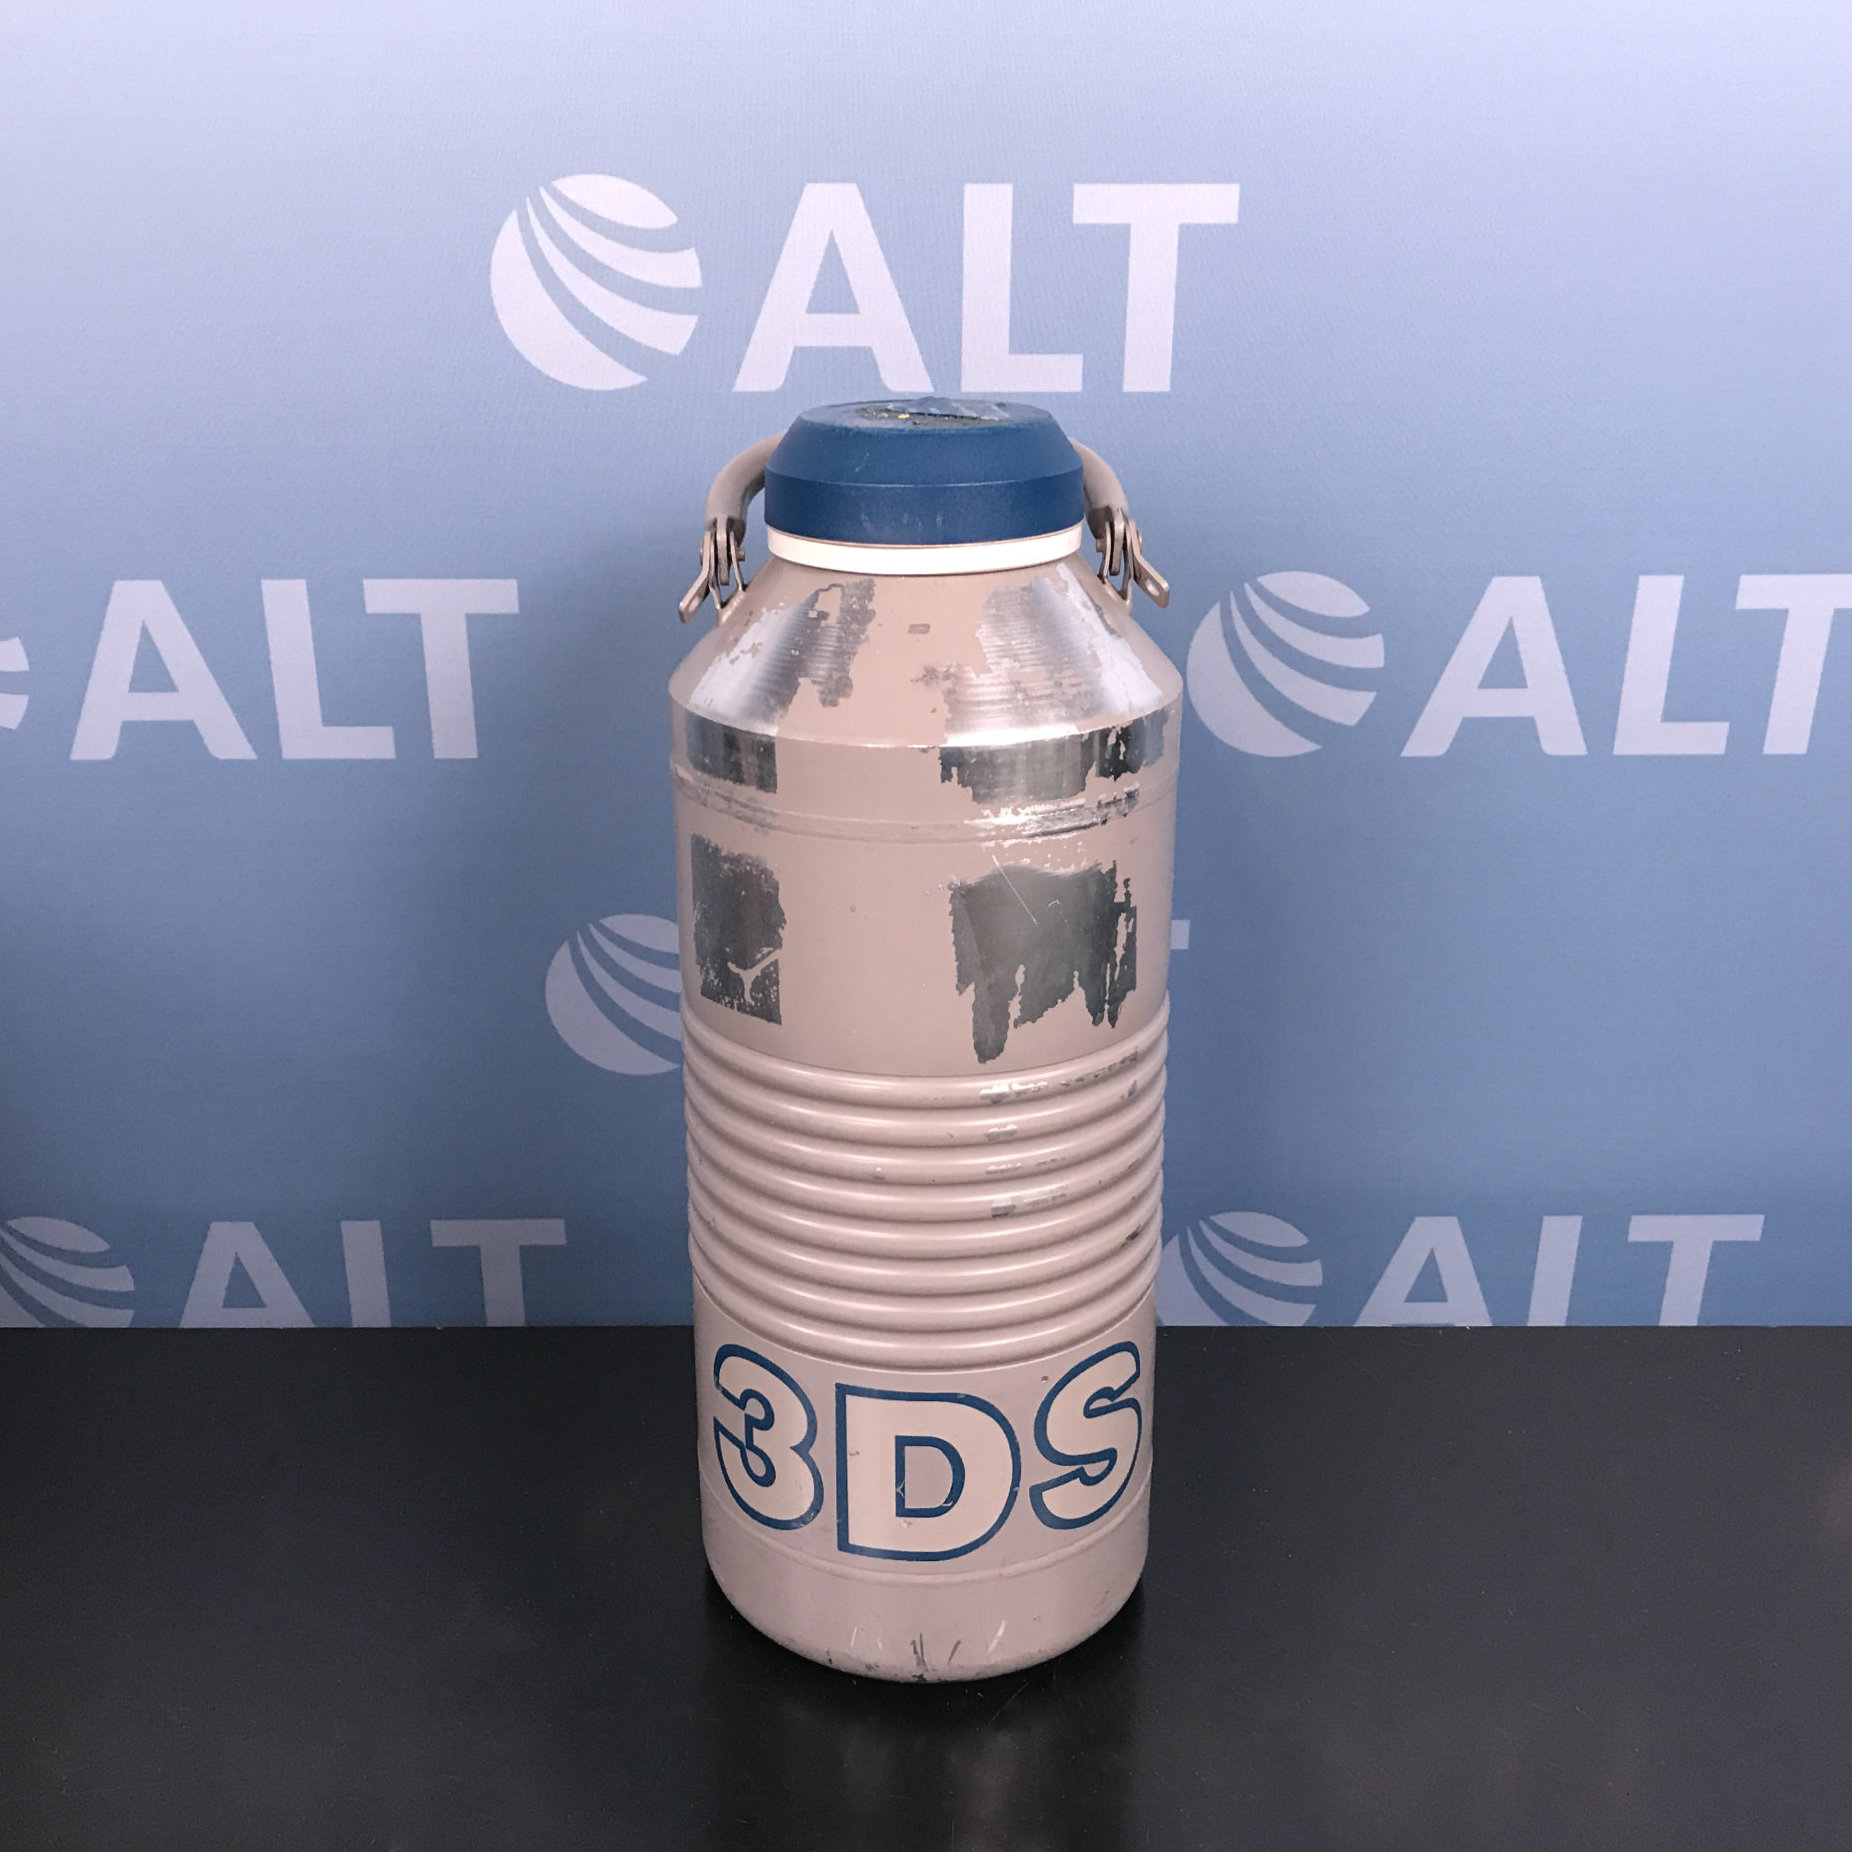 Taylor Wharton 3DS Dewar Canister Dry Vapor Image